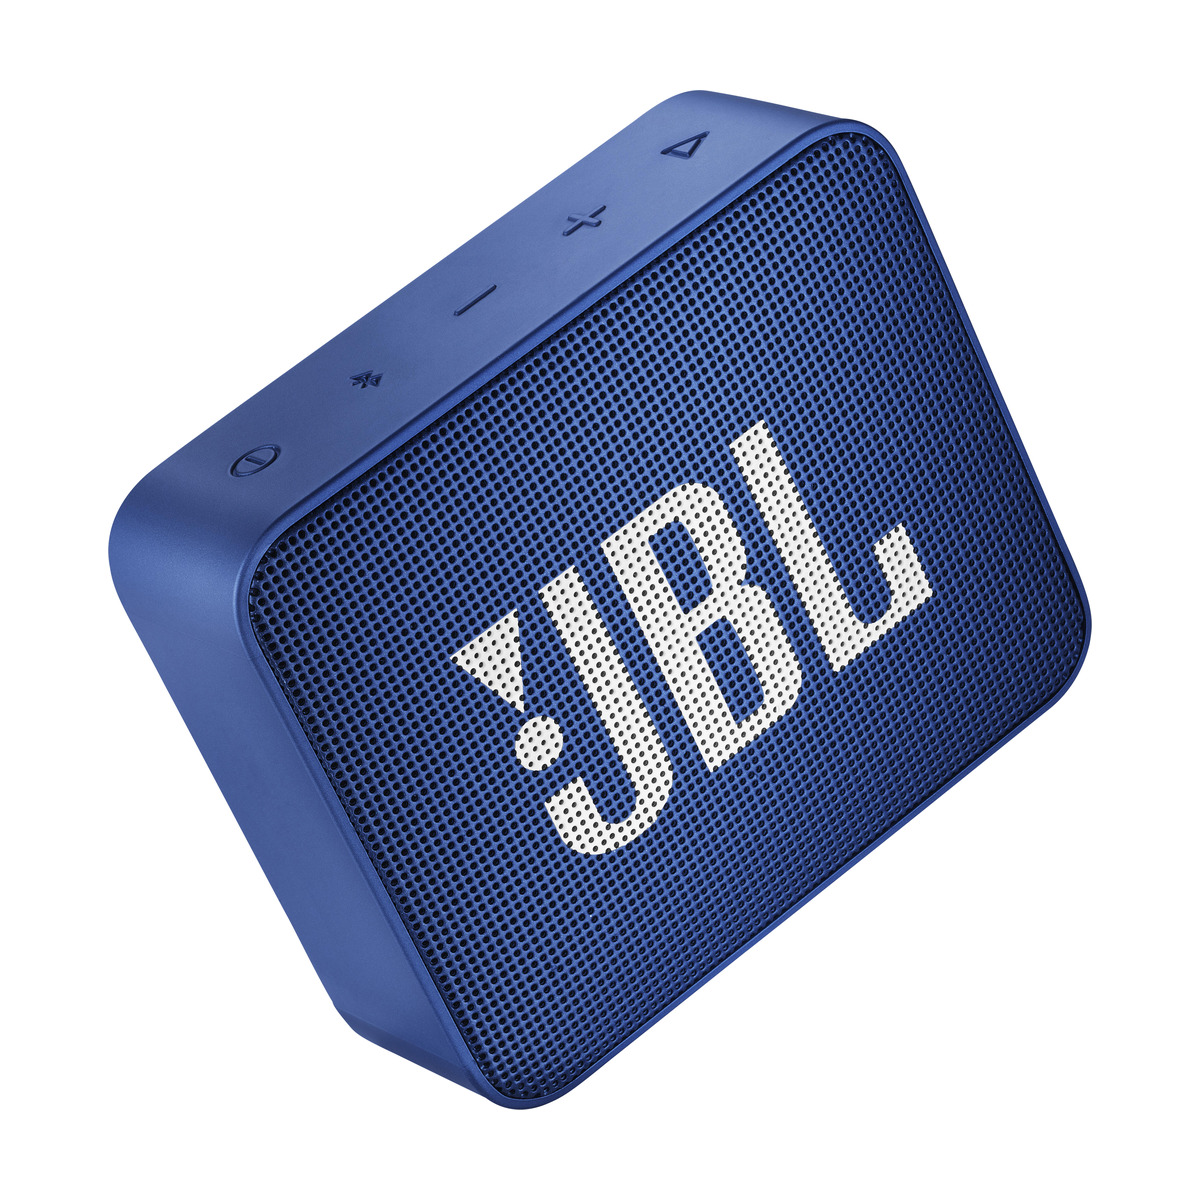 Philips bluetoothhögtalare & USB laddare Komplett.se